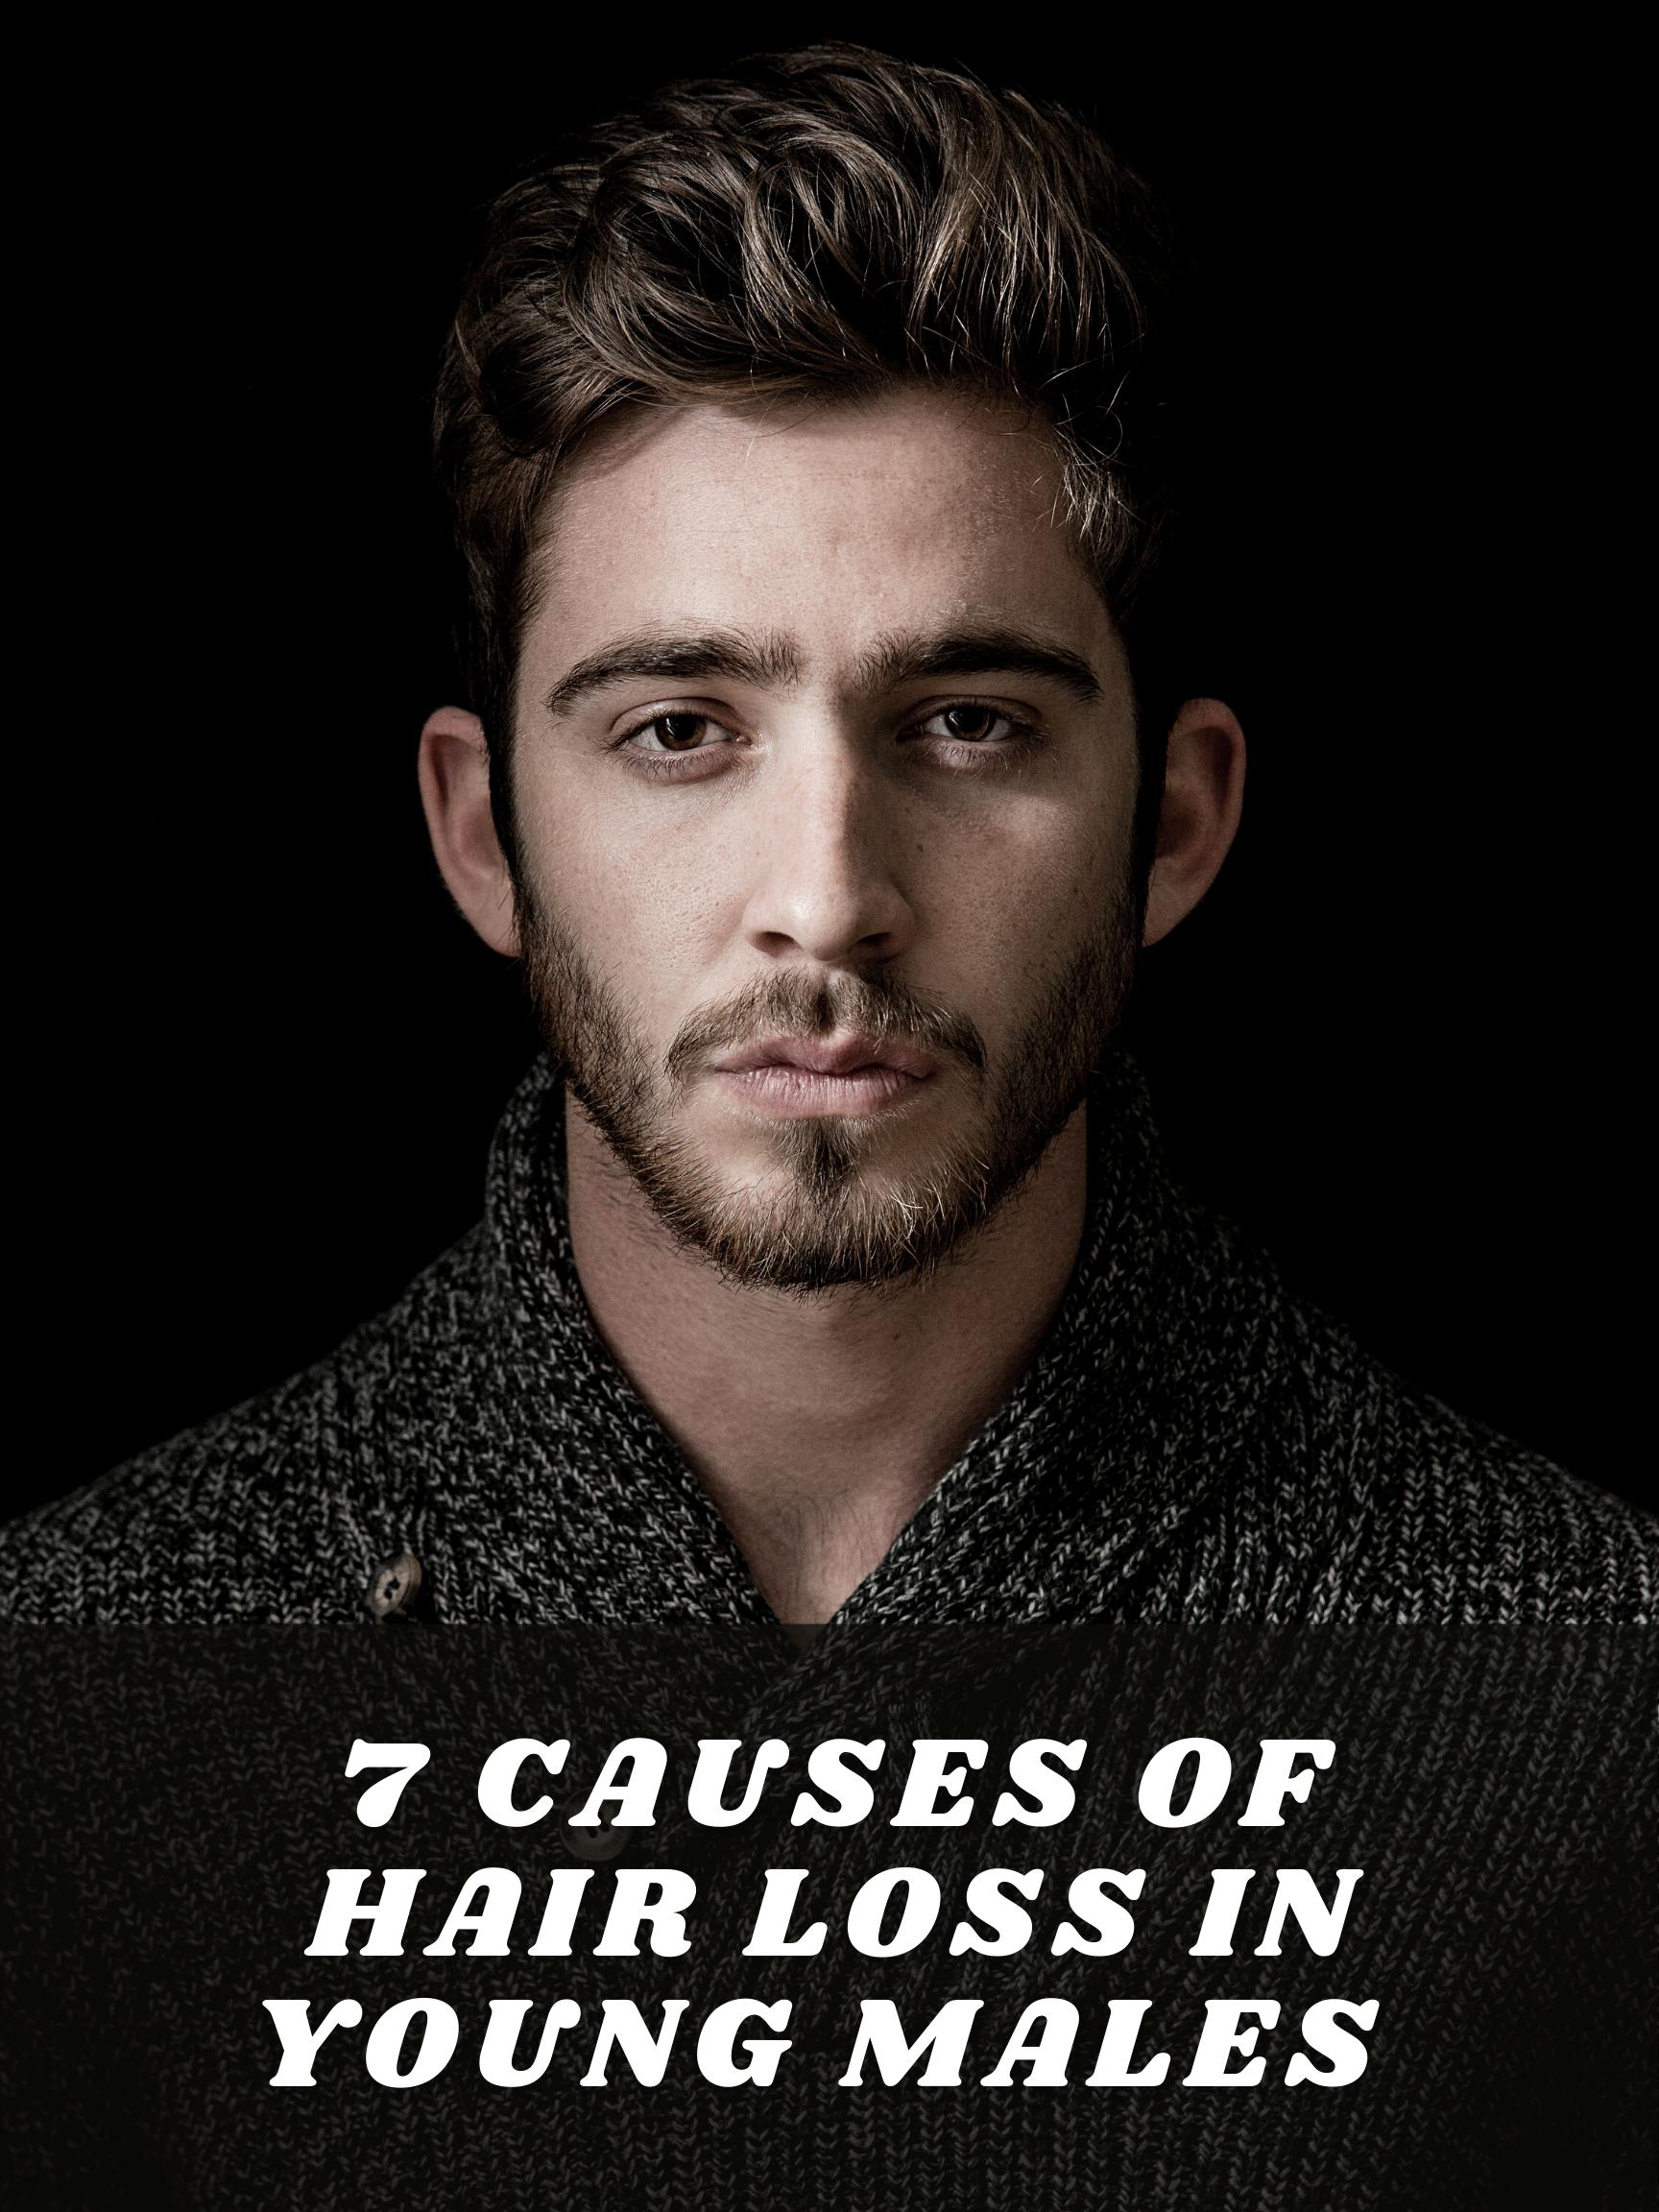 Reasons For Hair Loss In Men Under 25